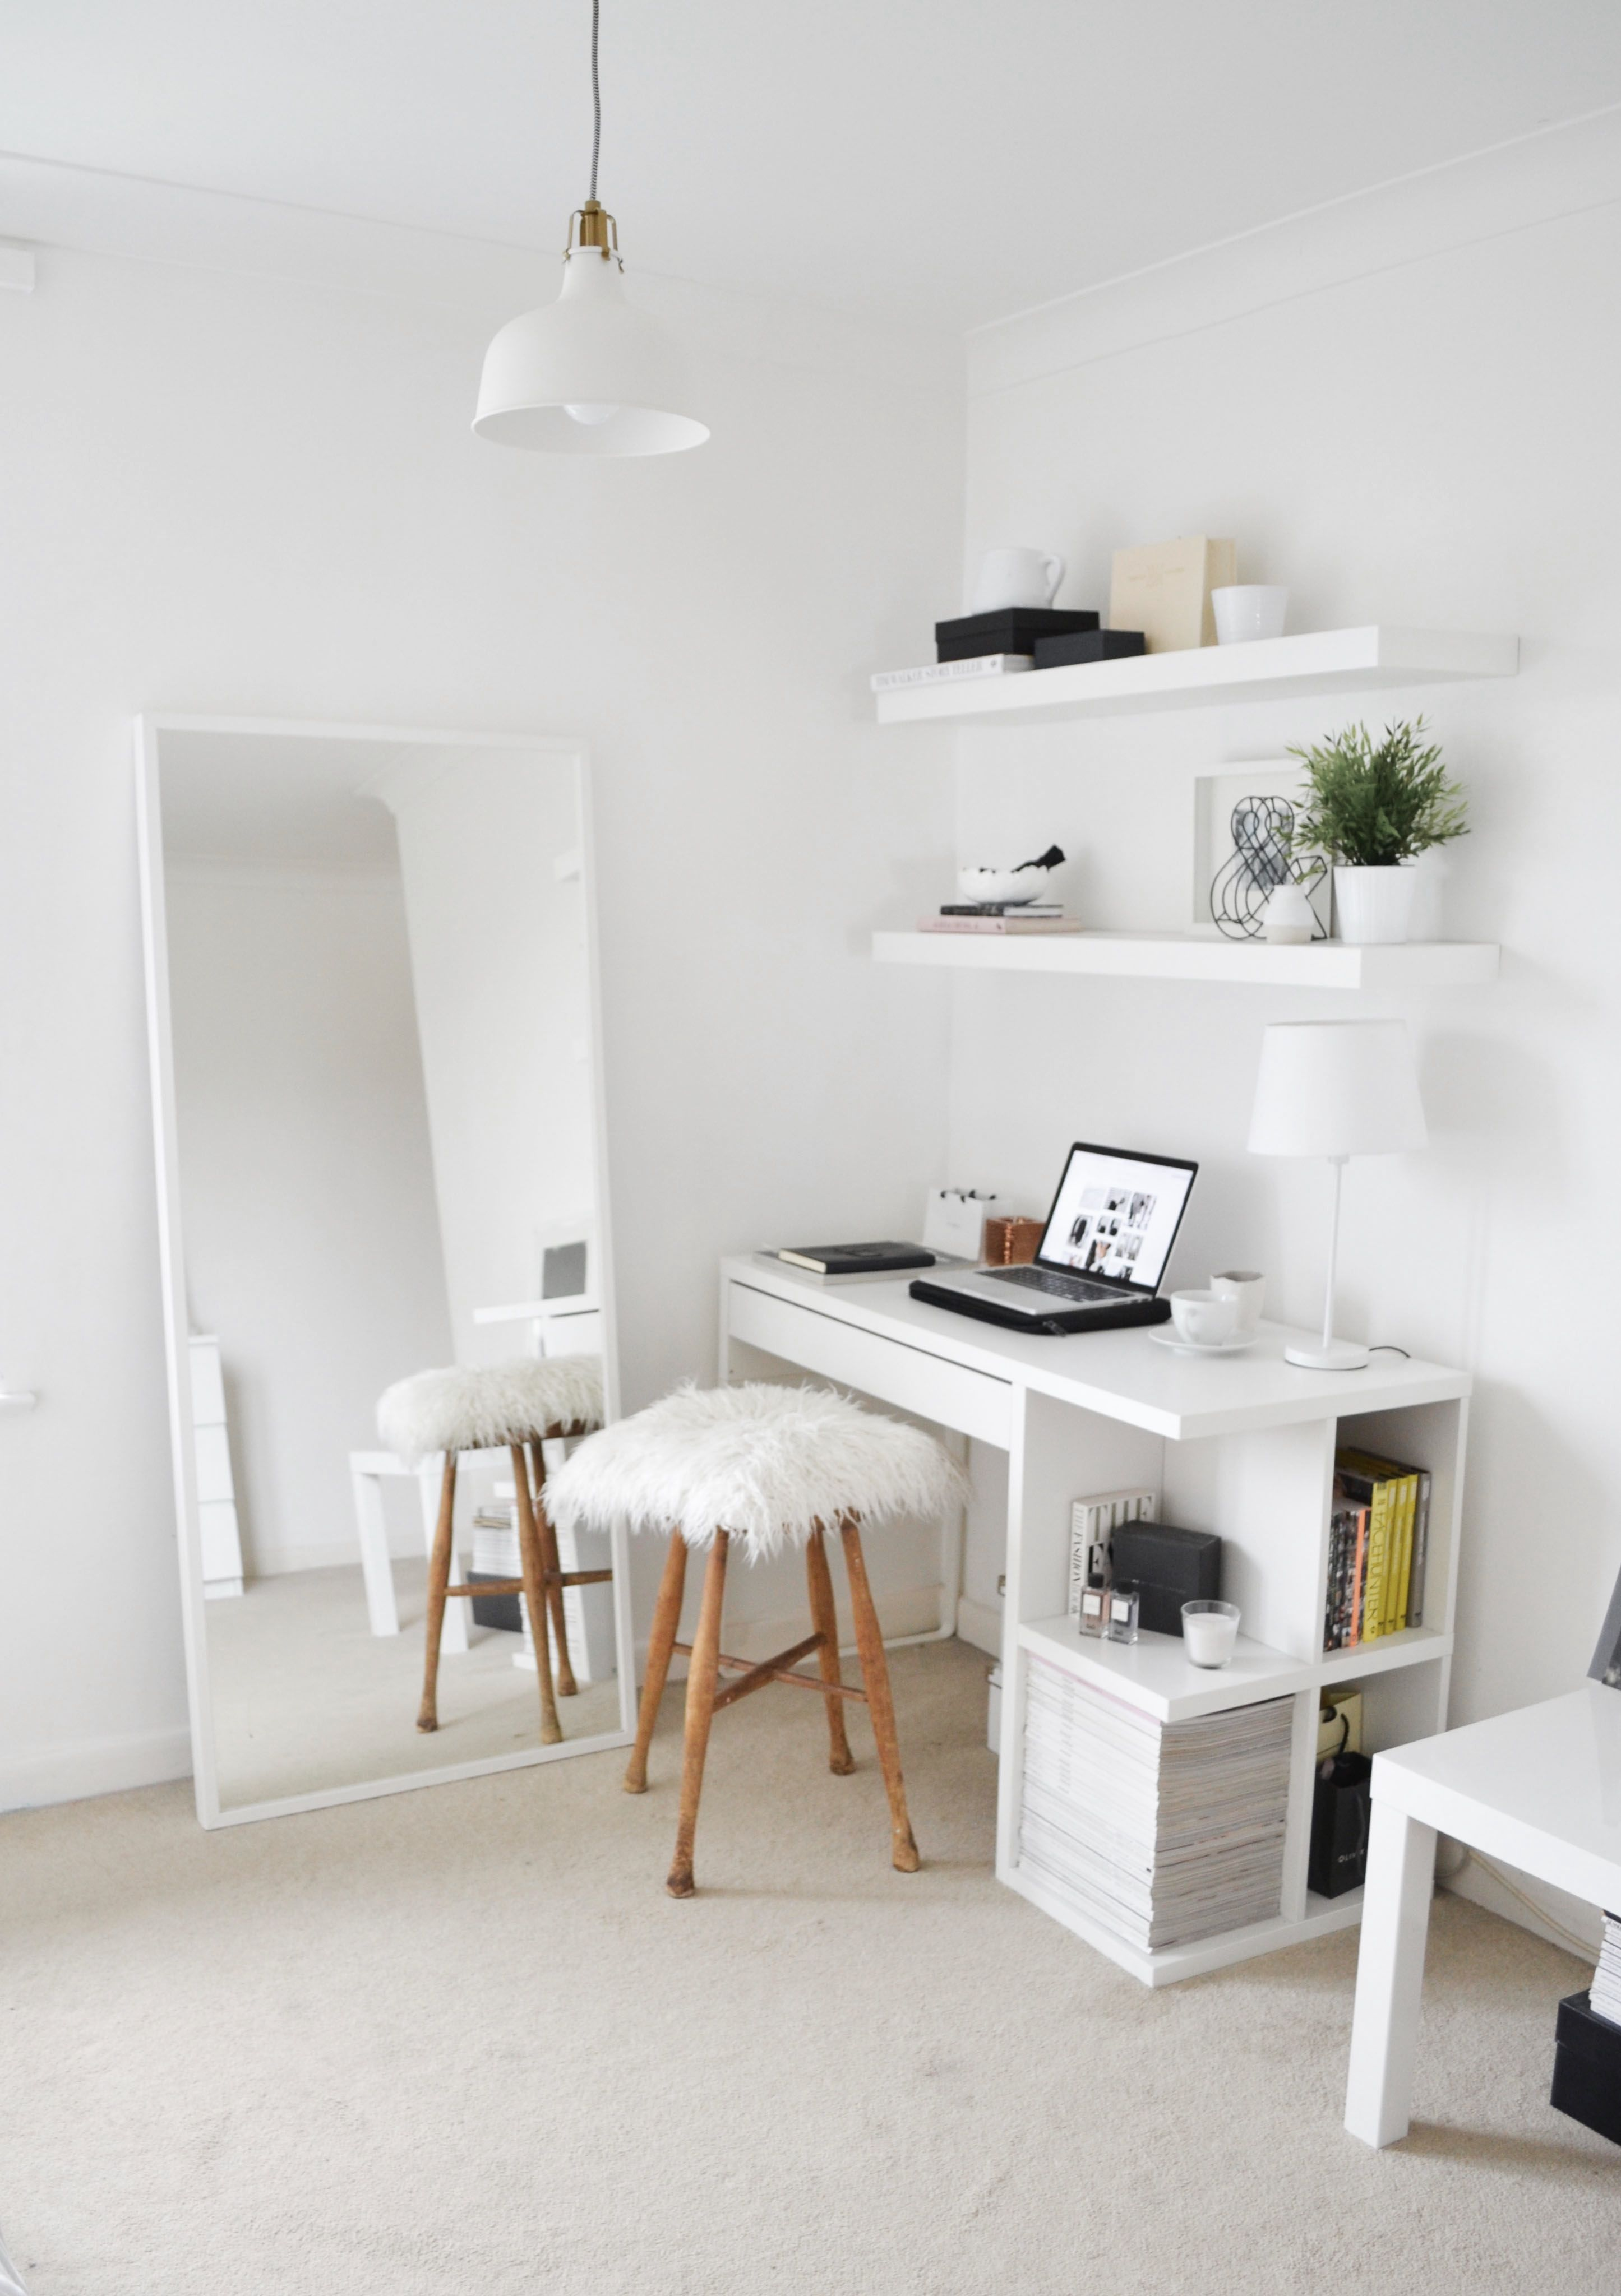 Minimal bedroom interior styling. White ikea furniture